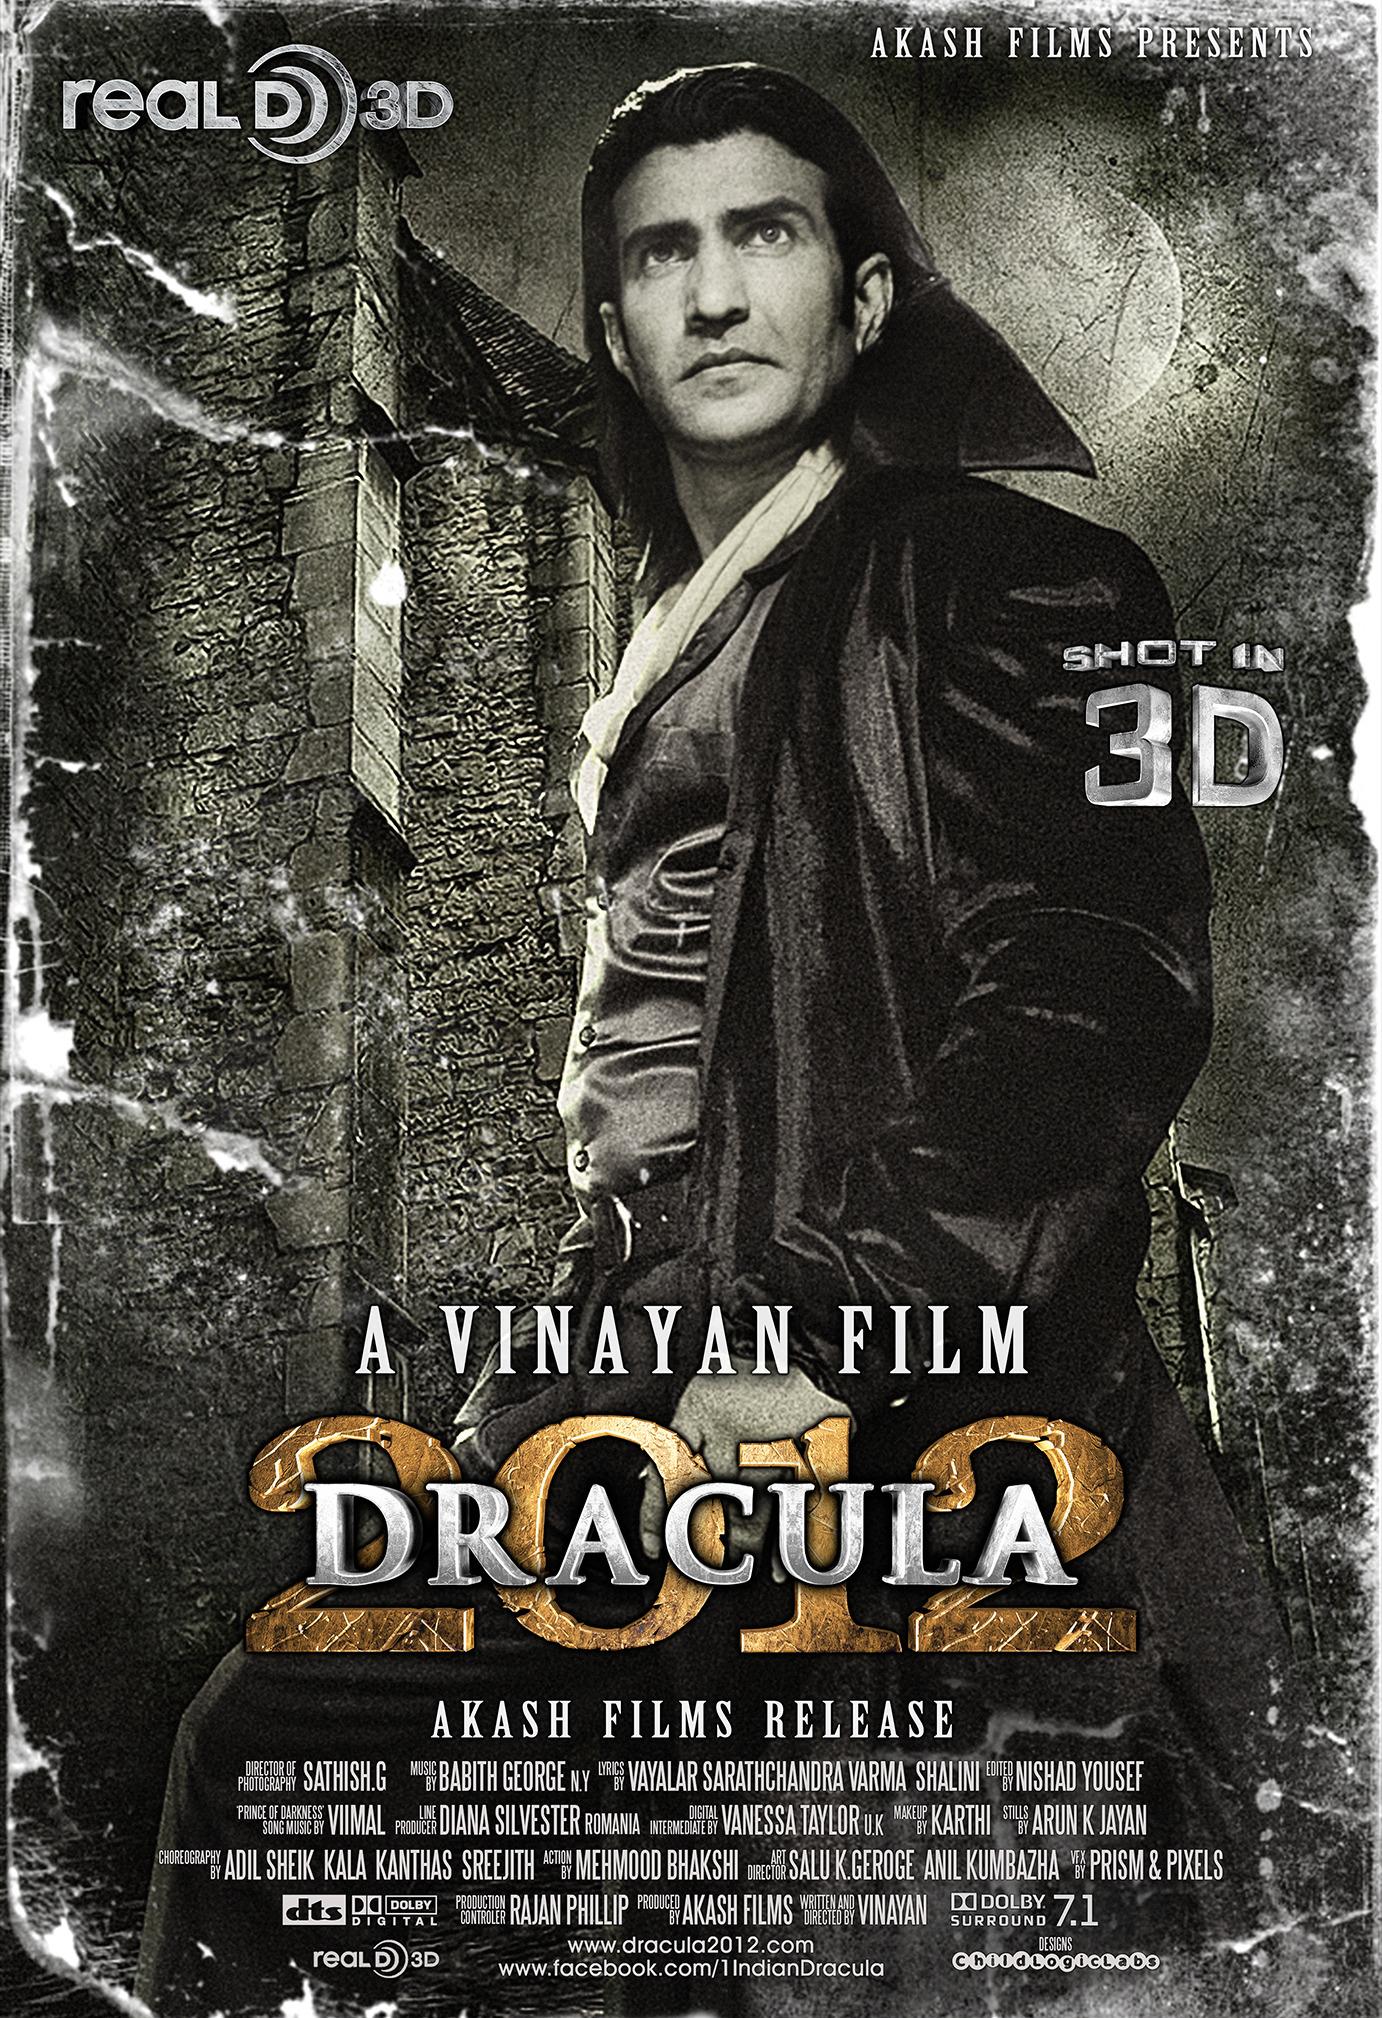 Dracula 2012 kapak